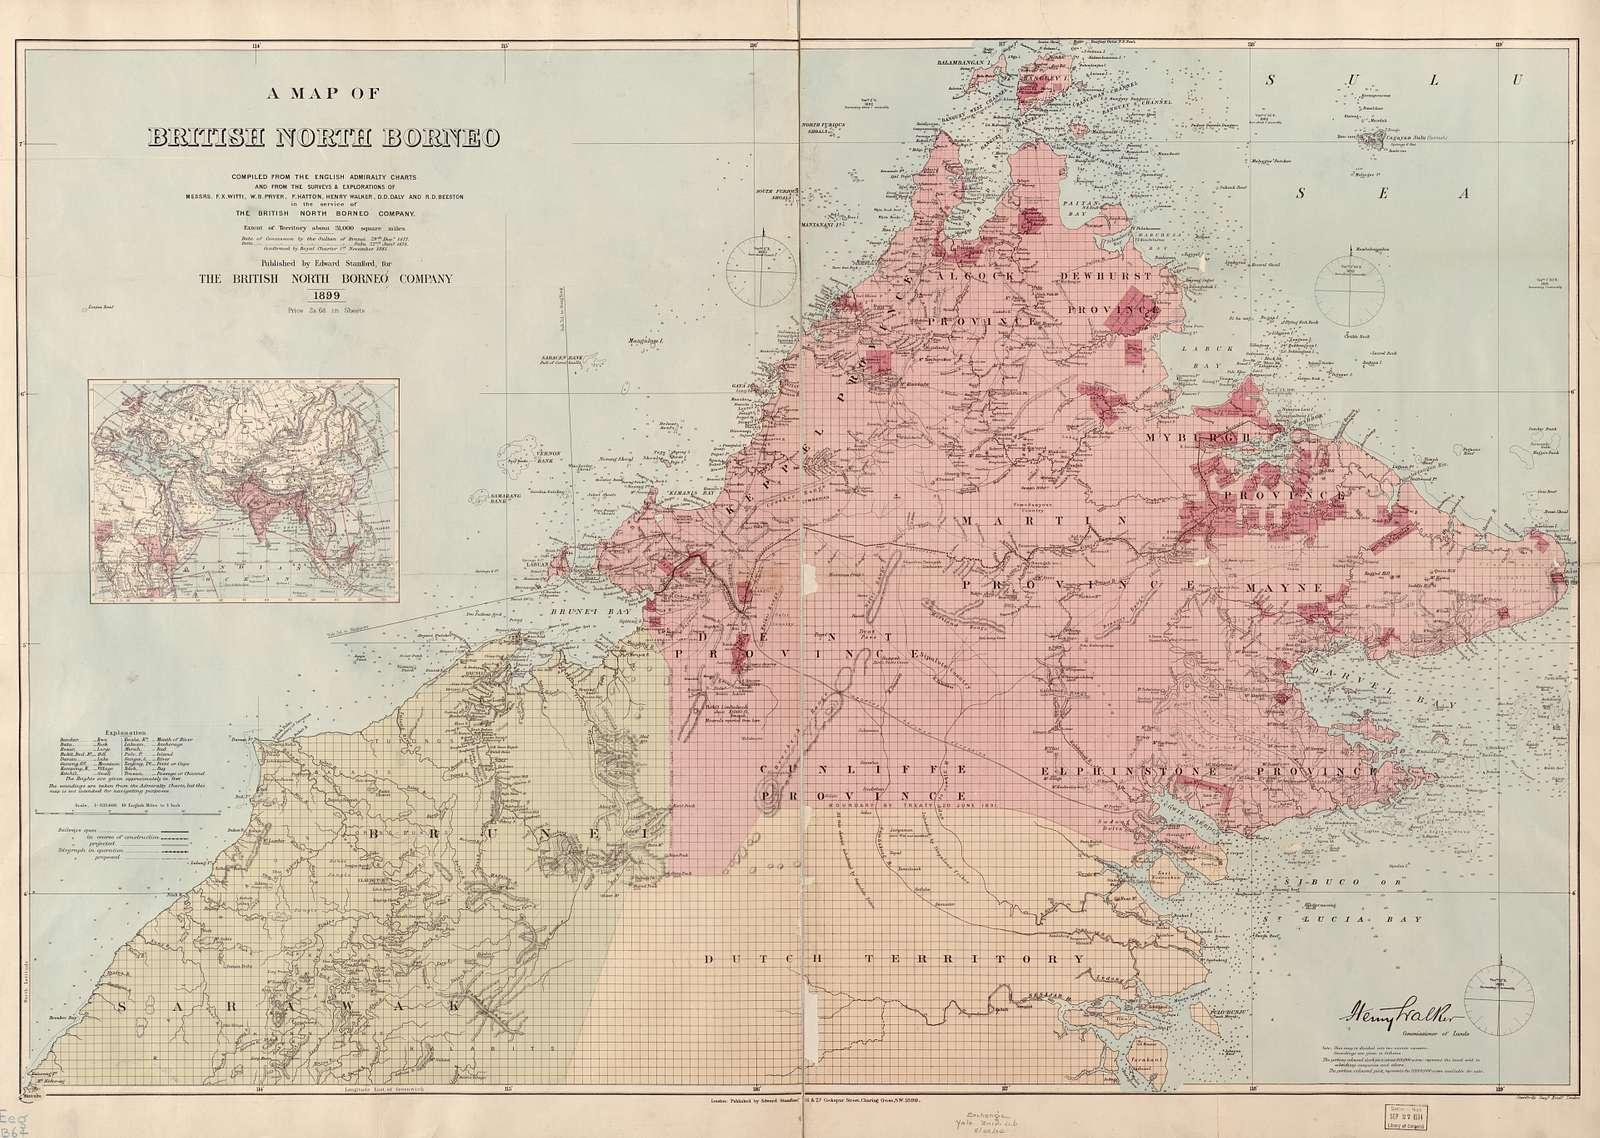 A map of British North Borneo /